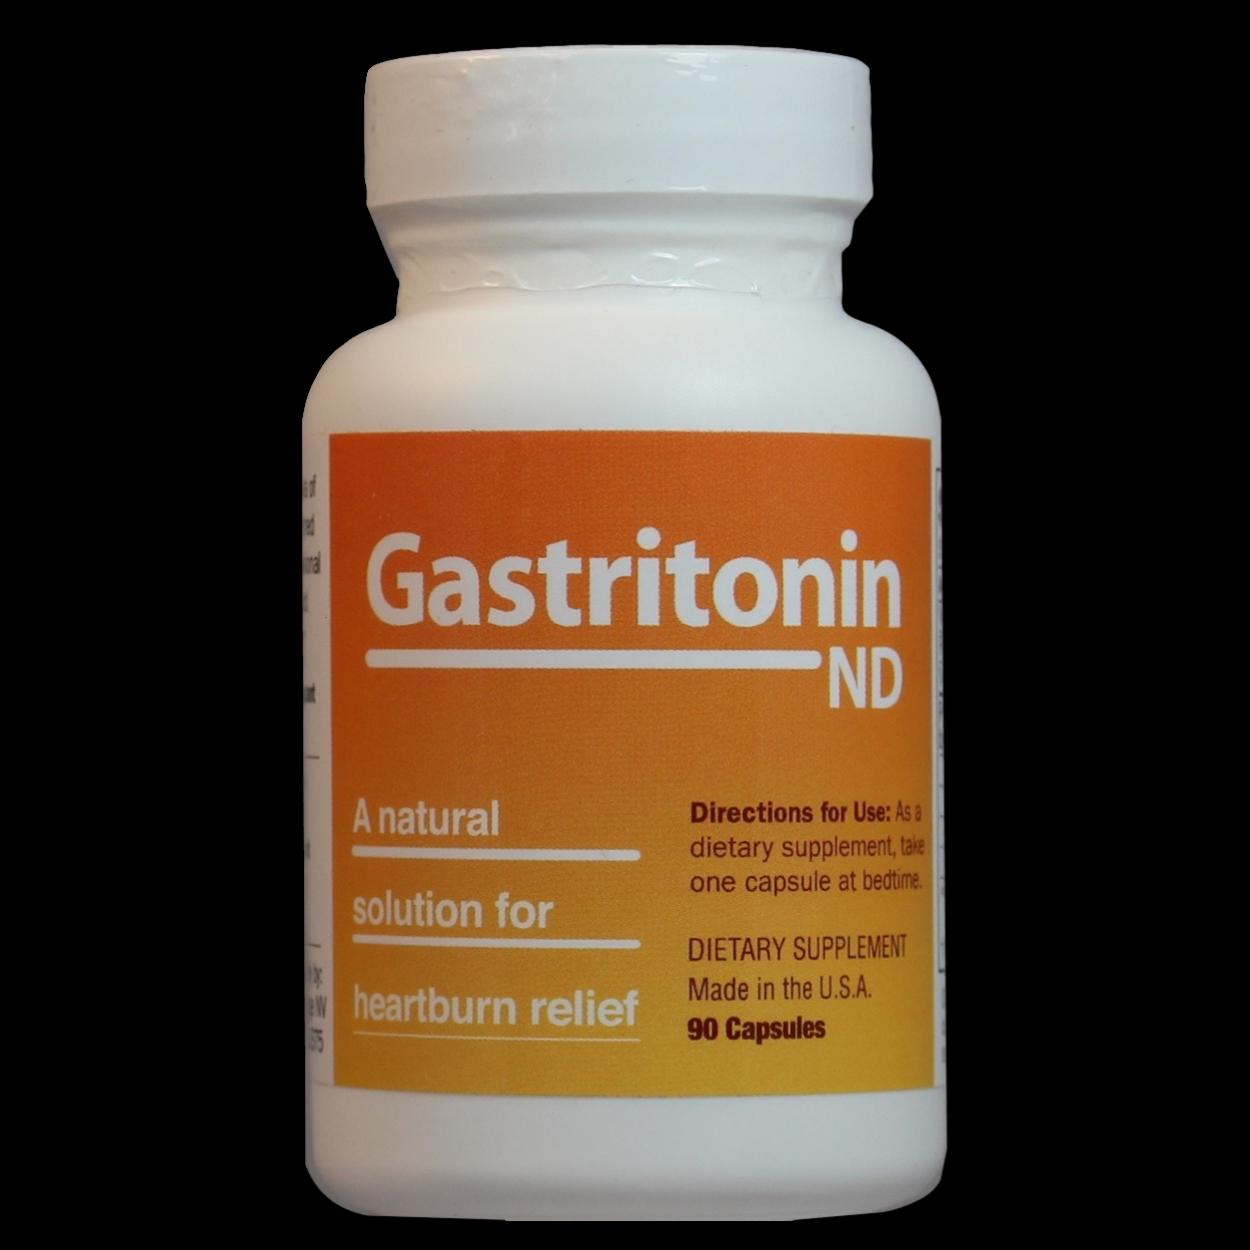 Gastritonin ND 90